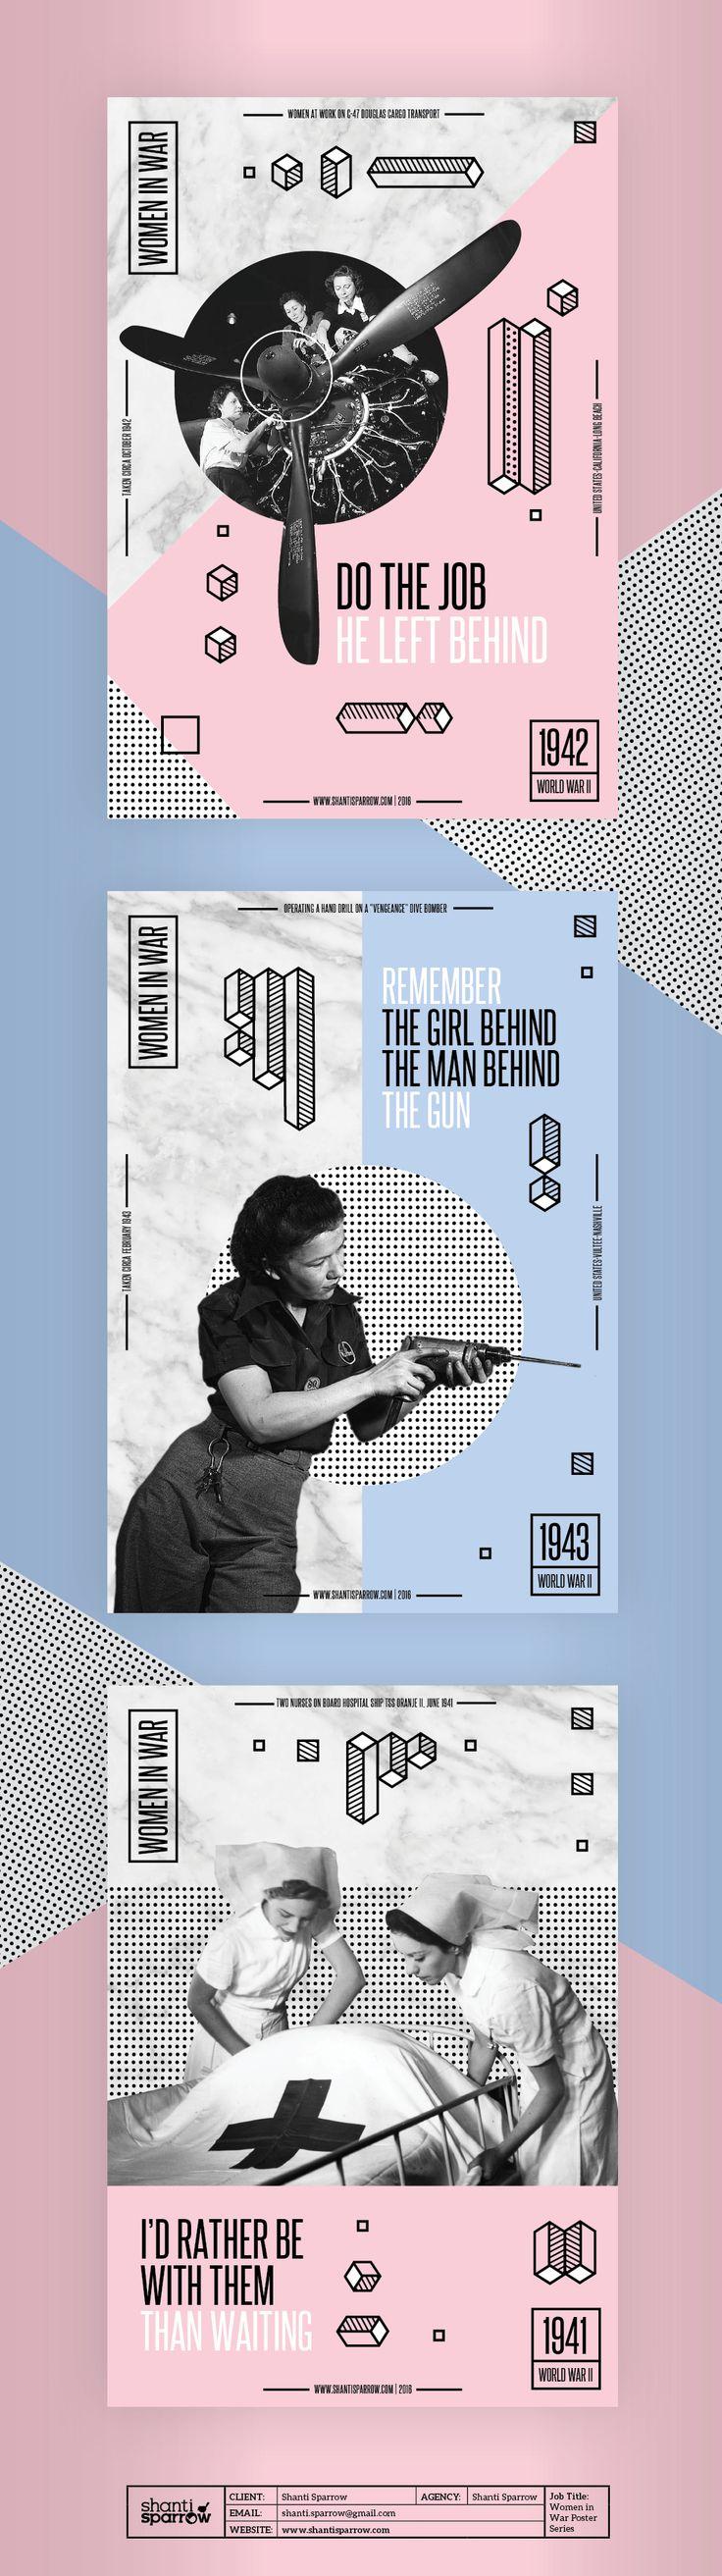 Women in War Poster Series on Behance